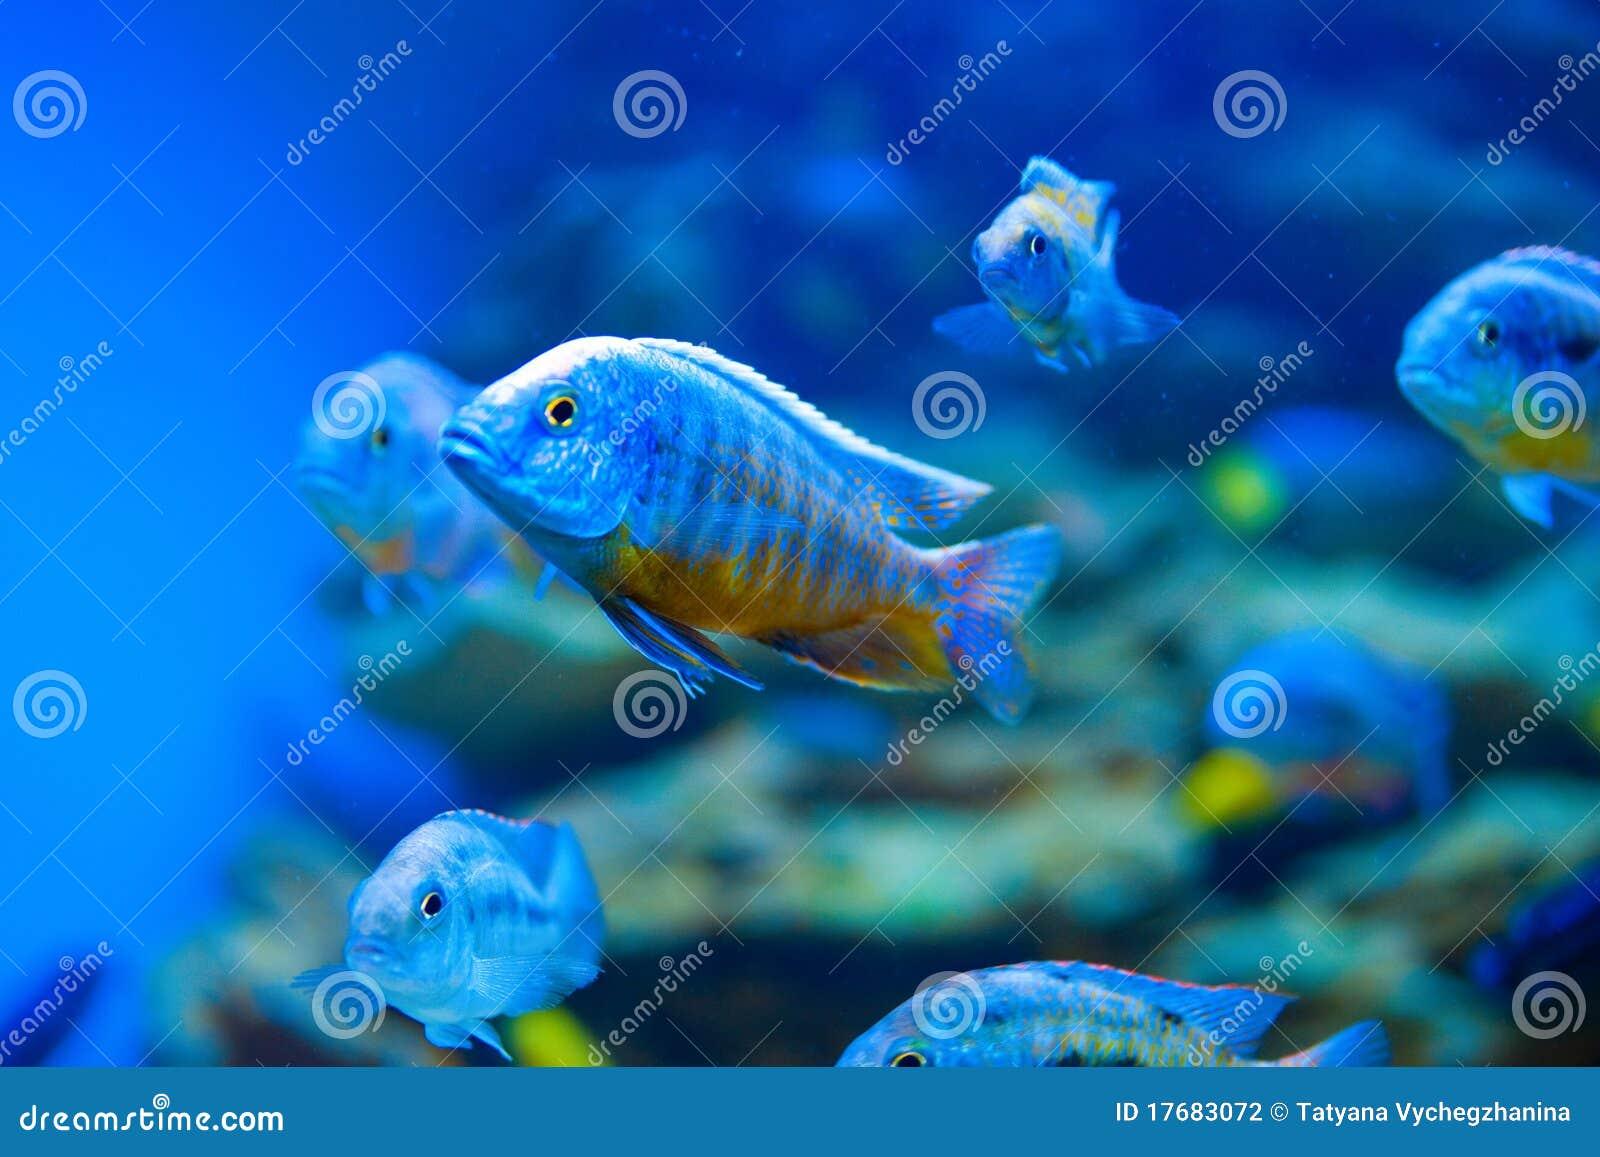 Colorful Fish Aquarium Stock Photography Image 17683072